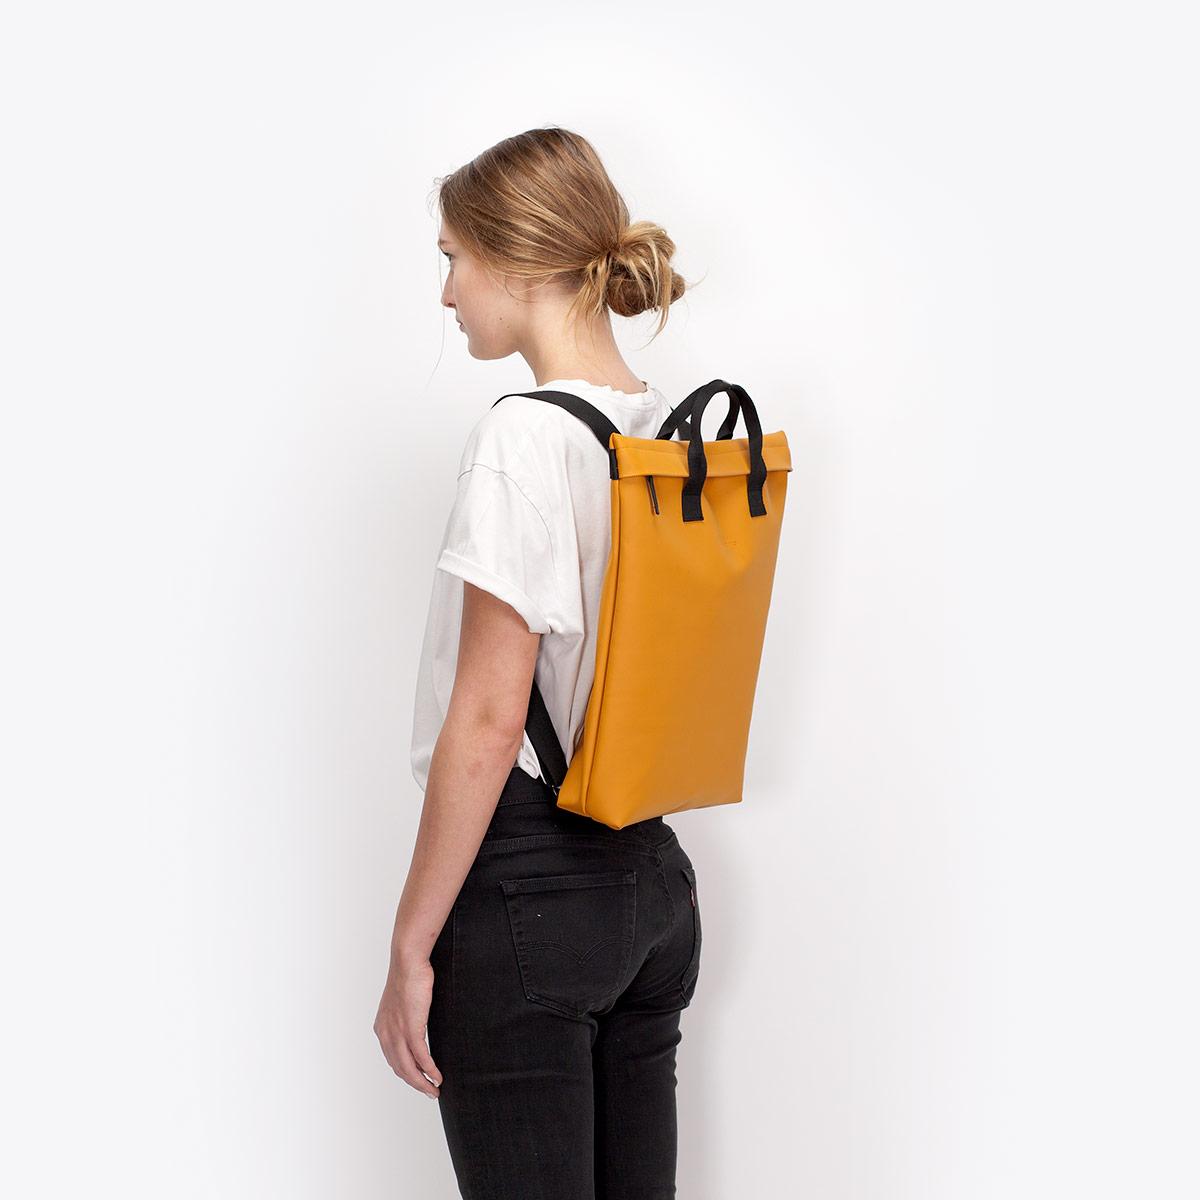 UA_Till-Bag_Lotus-Series_Honey-Mustard_07GZaYA9oyauBOq